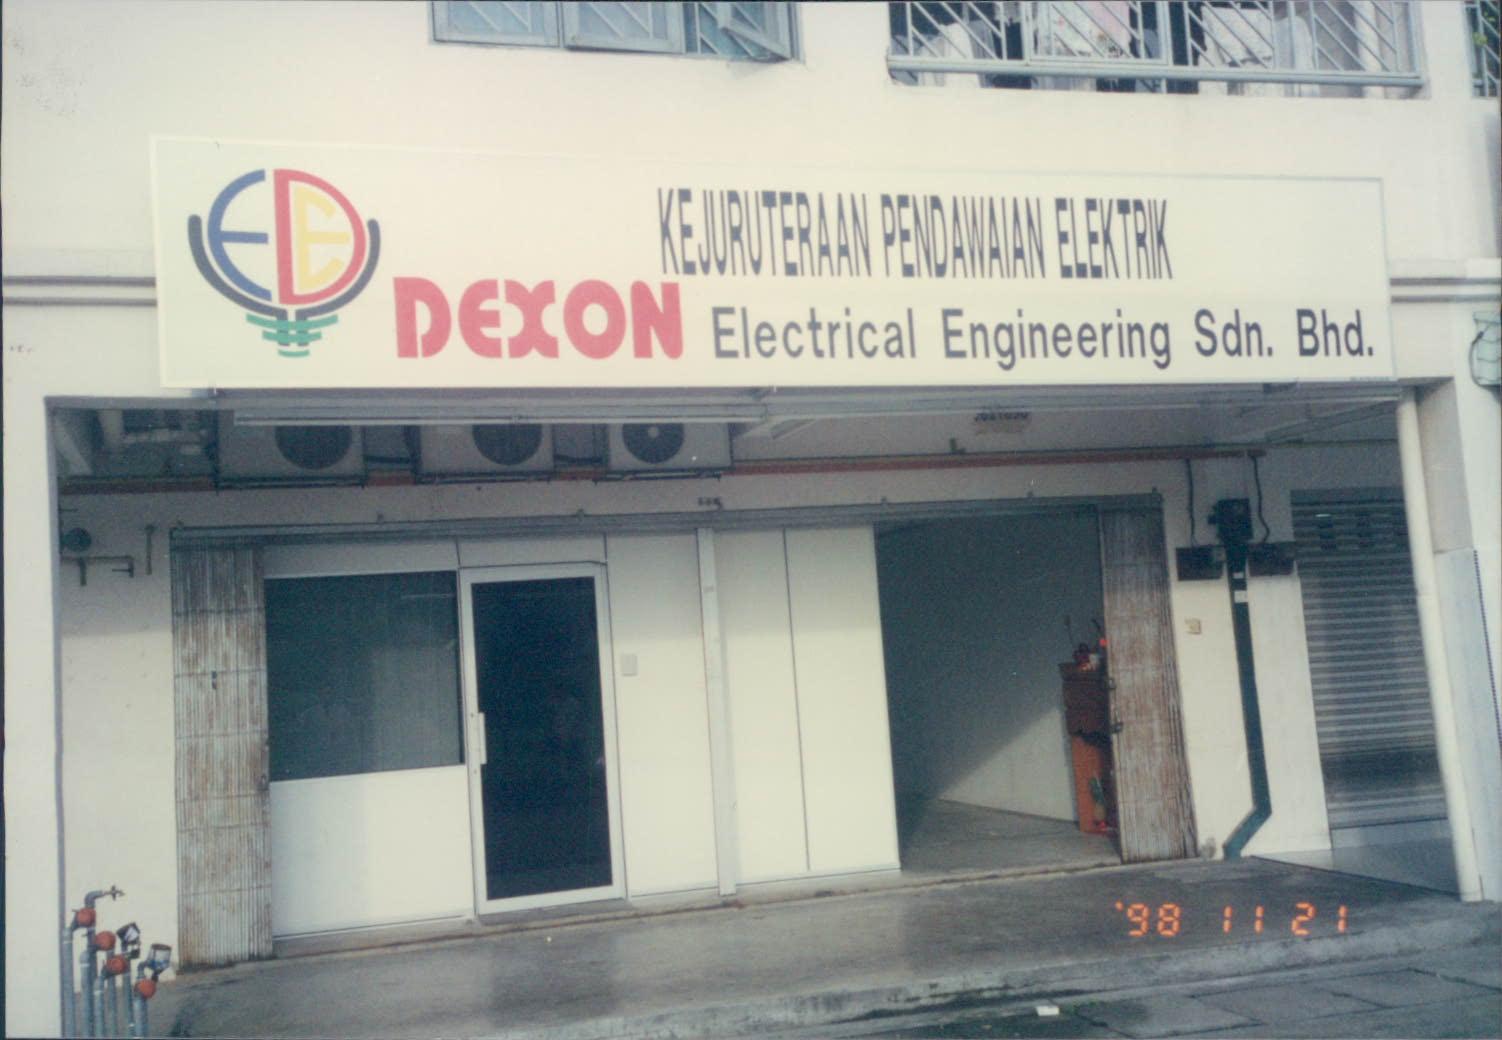 Dexon-Electrical-Engineering-1999